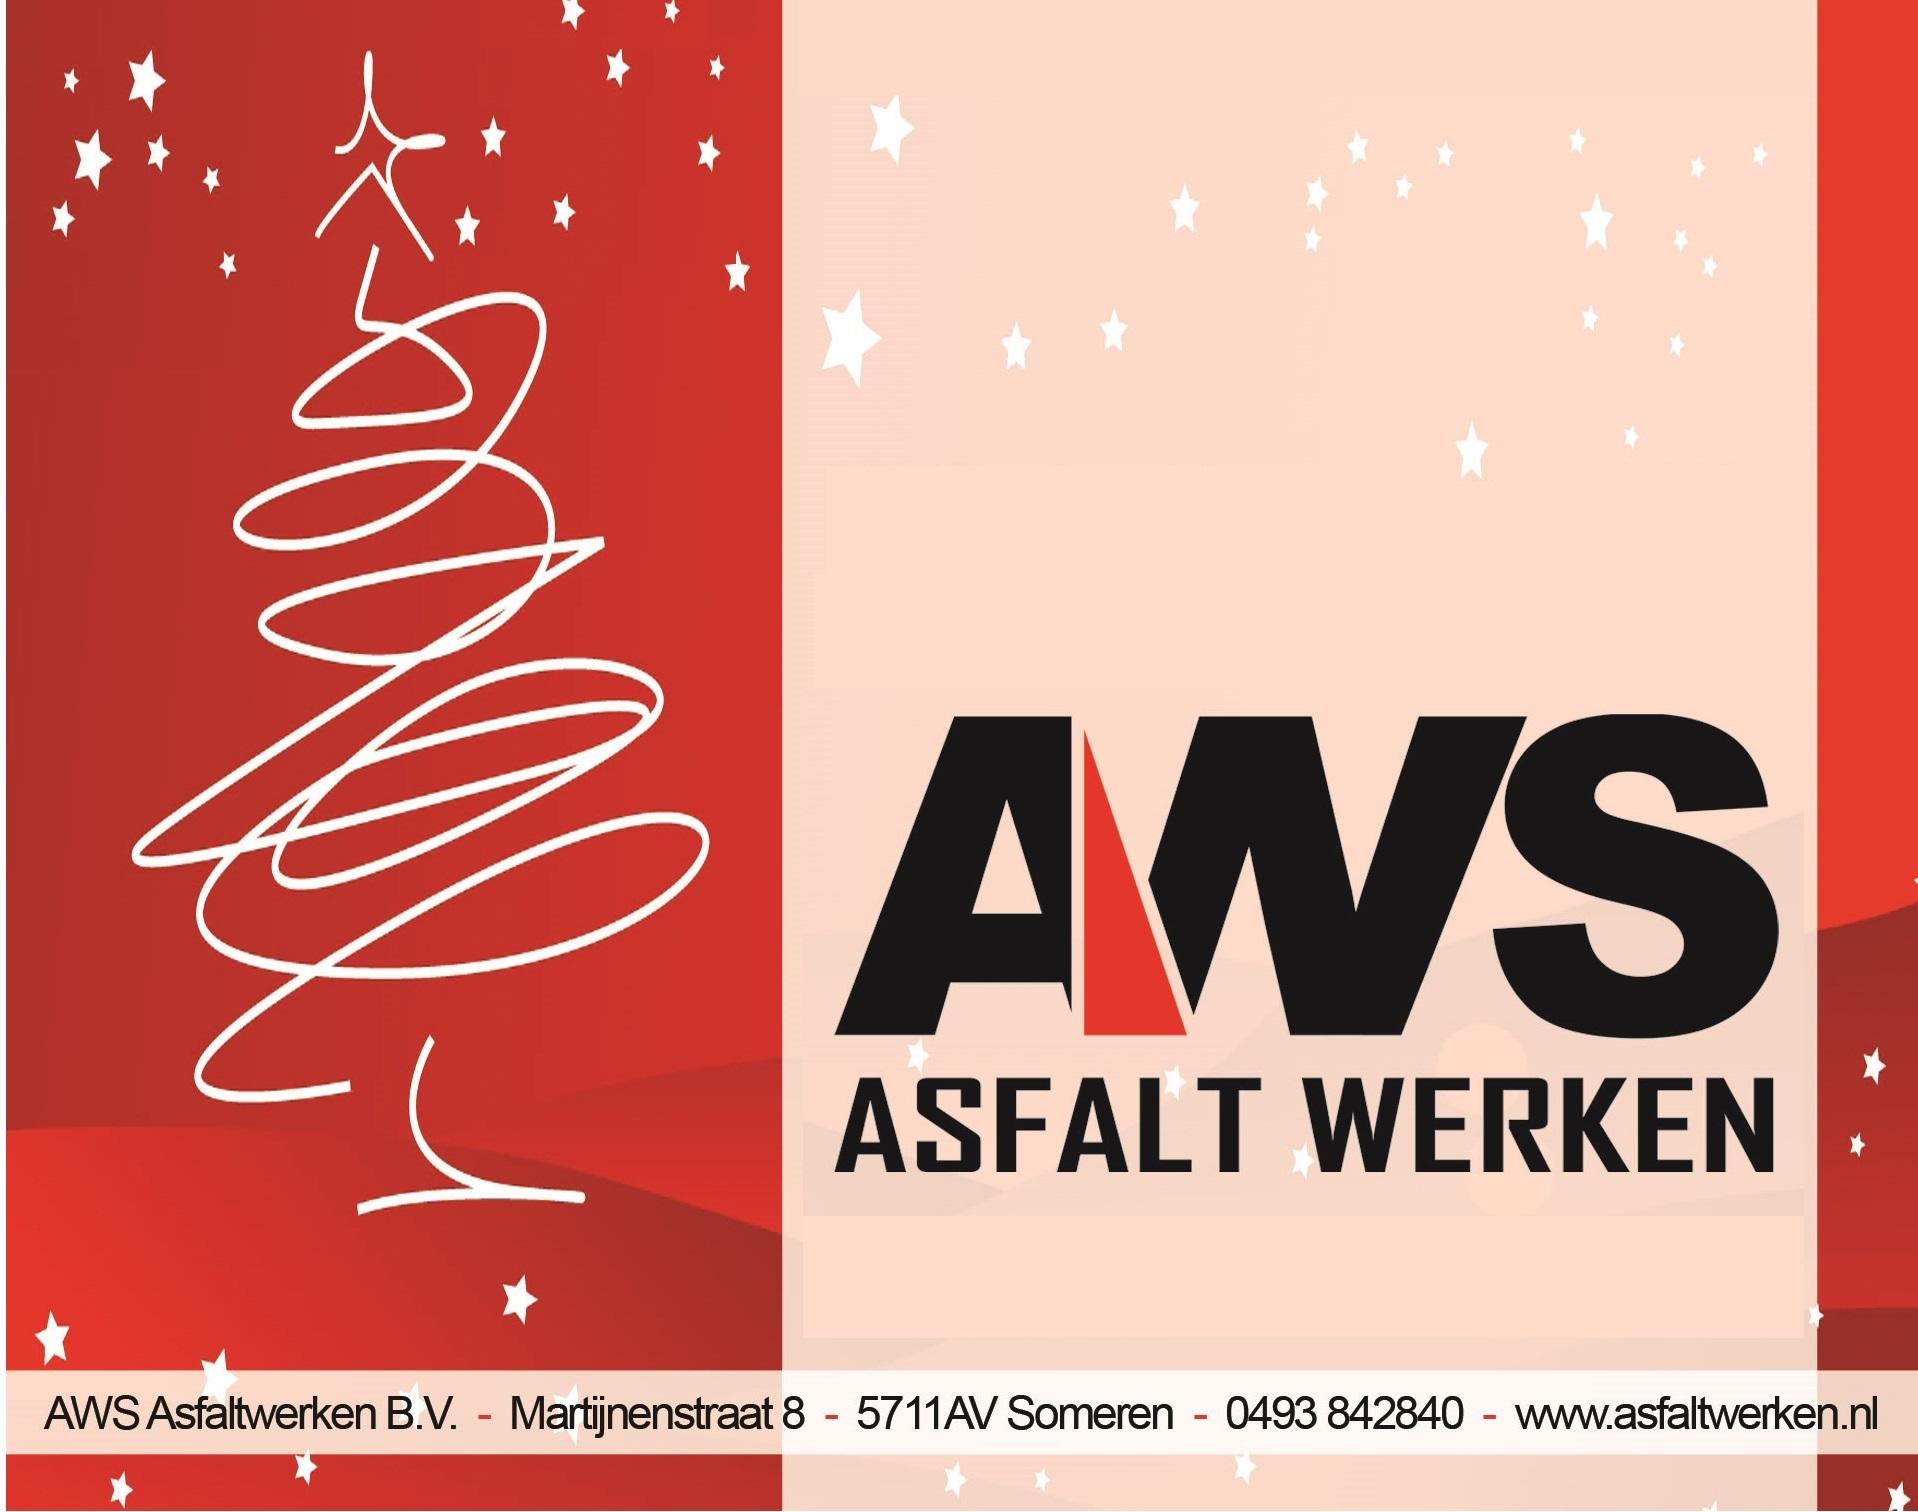 www.asfaltwerken.nl